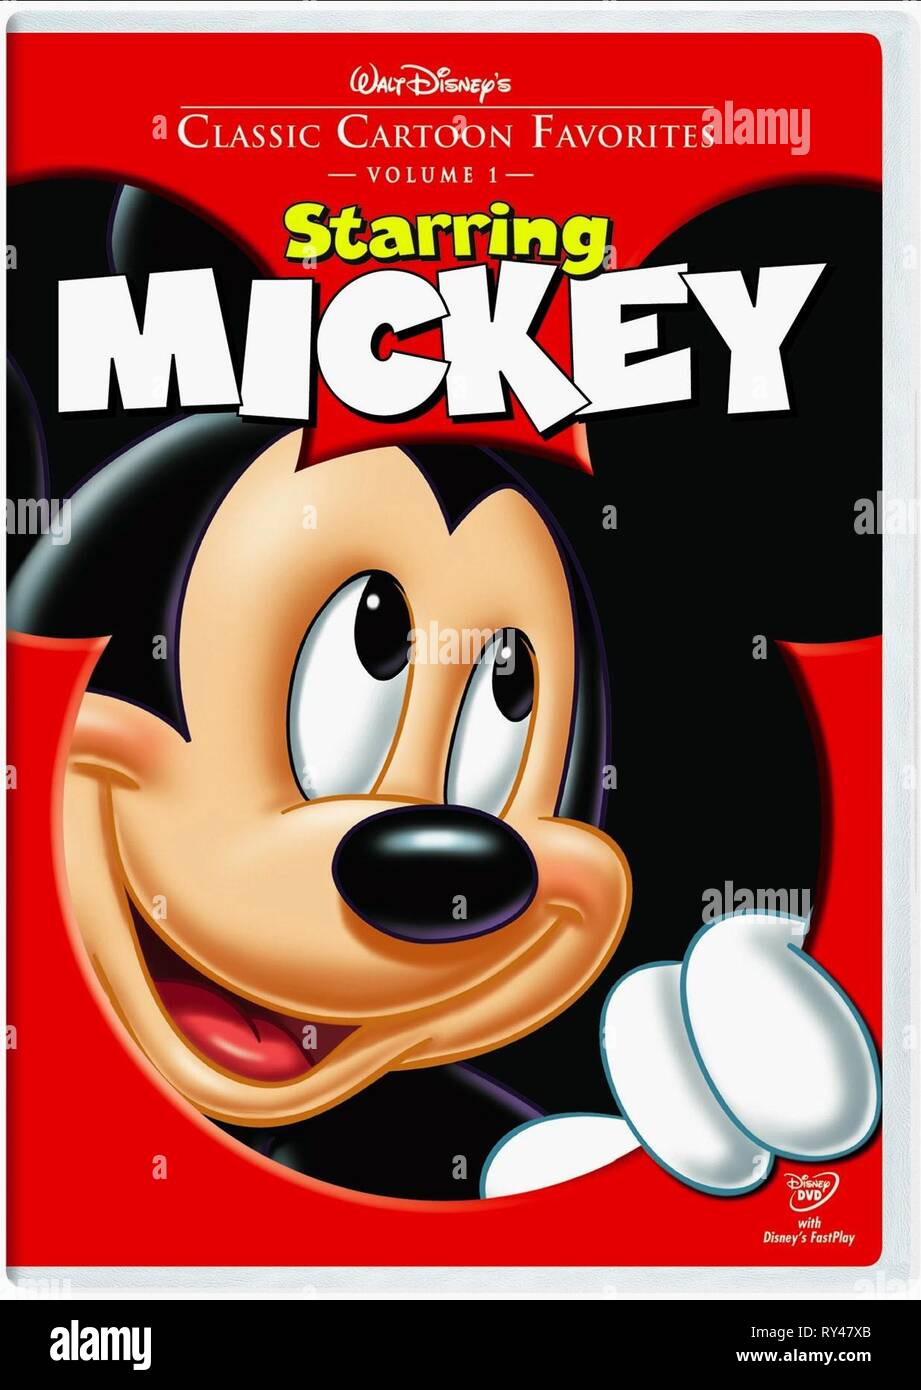 MICKEY MOUSE, CLASSIC Cartoon Preferiti: VOLUME 1 - Starring Mickey, 2005 Immagini Stock